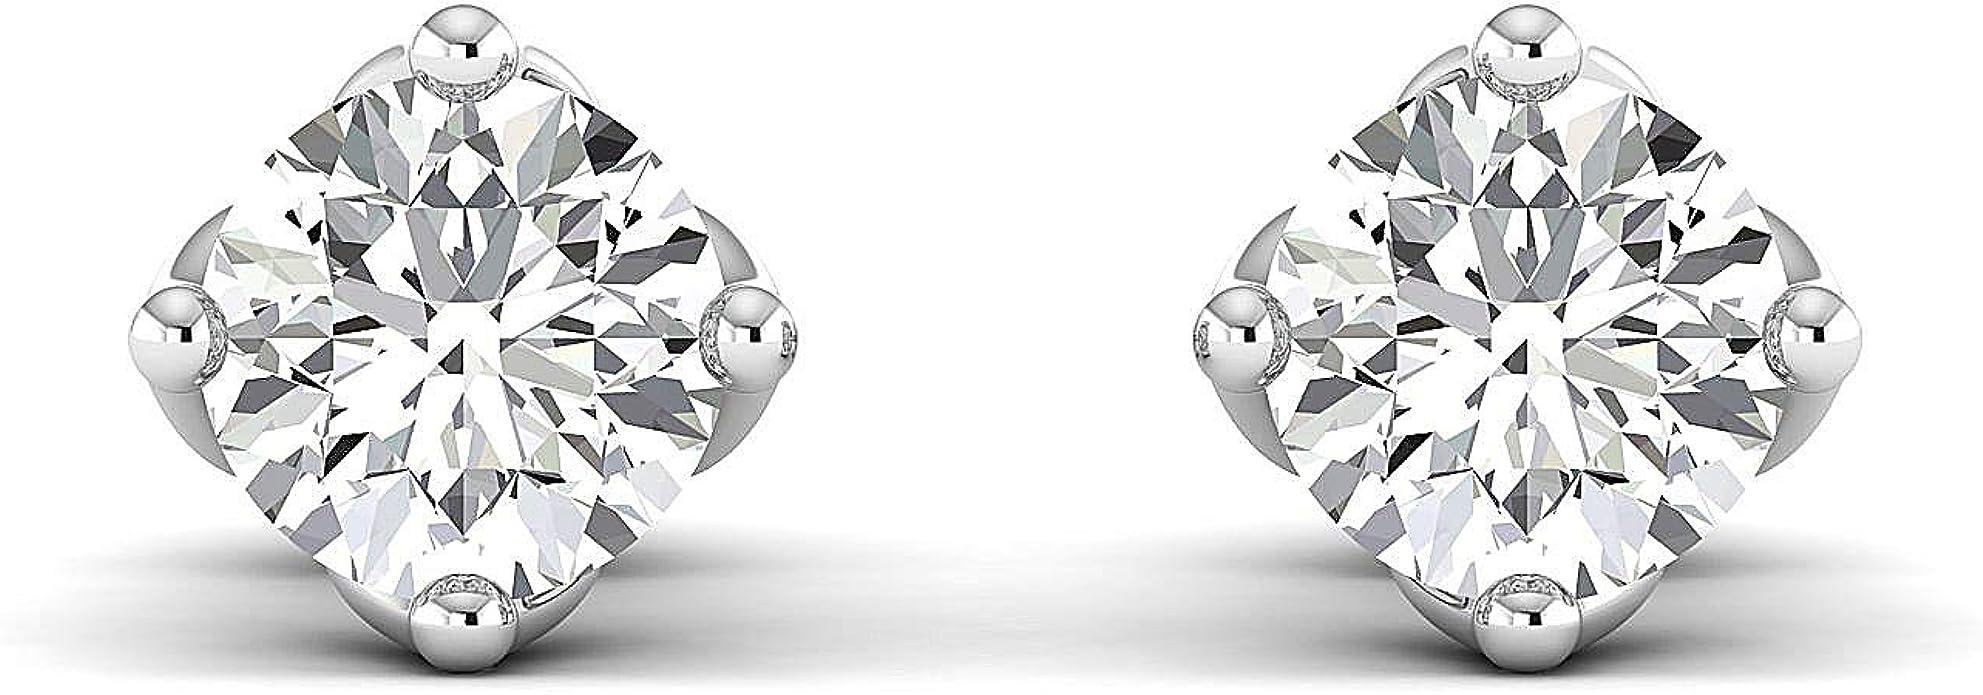 Stud Earrings for Women perfect Jewelry Gifts for Women Teen Girls Round Brilliant GH//VVS 14K rose-gold Earring Studs 0.3 to 4 Carat Moissanite Stud Earrings